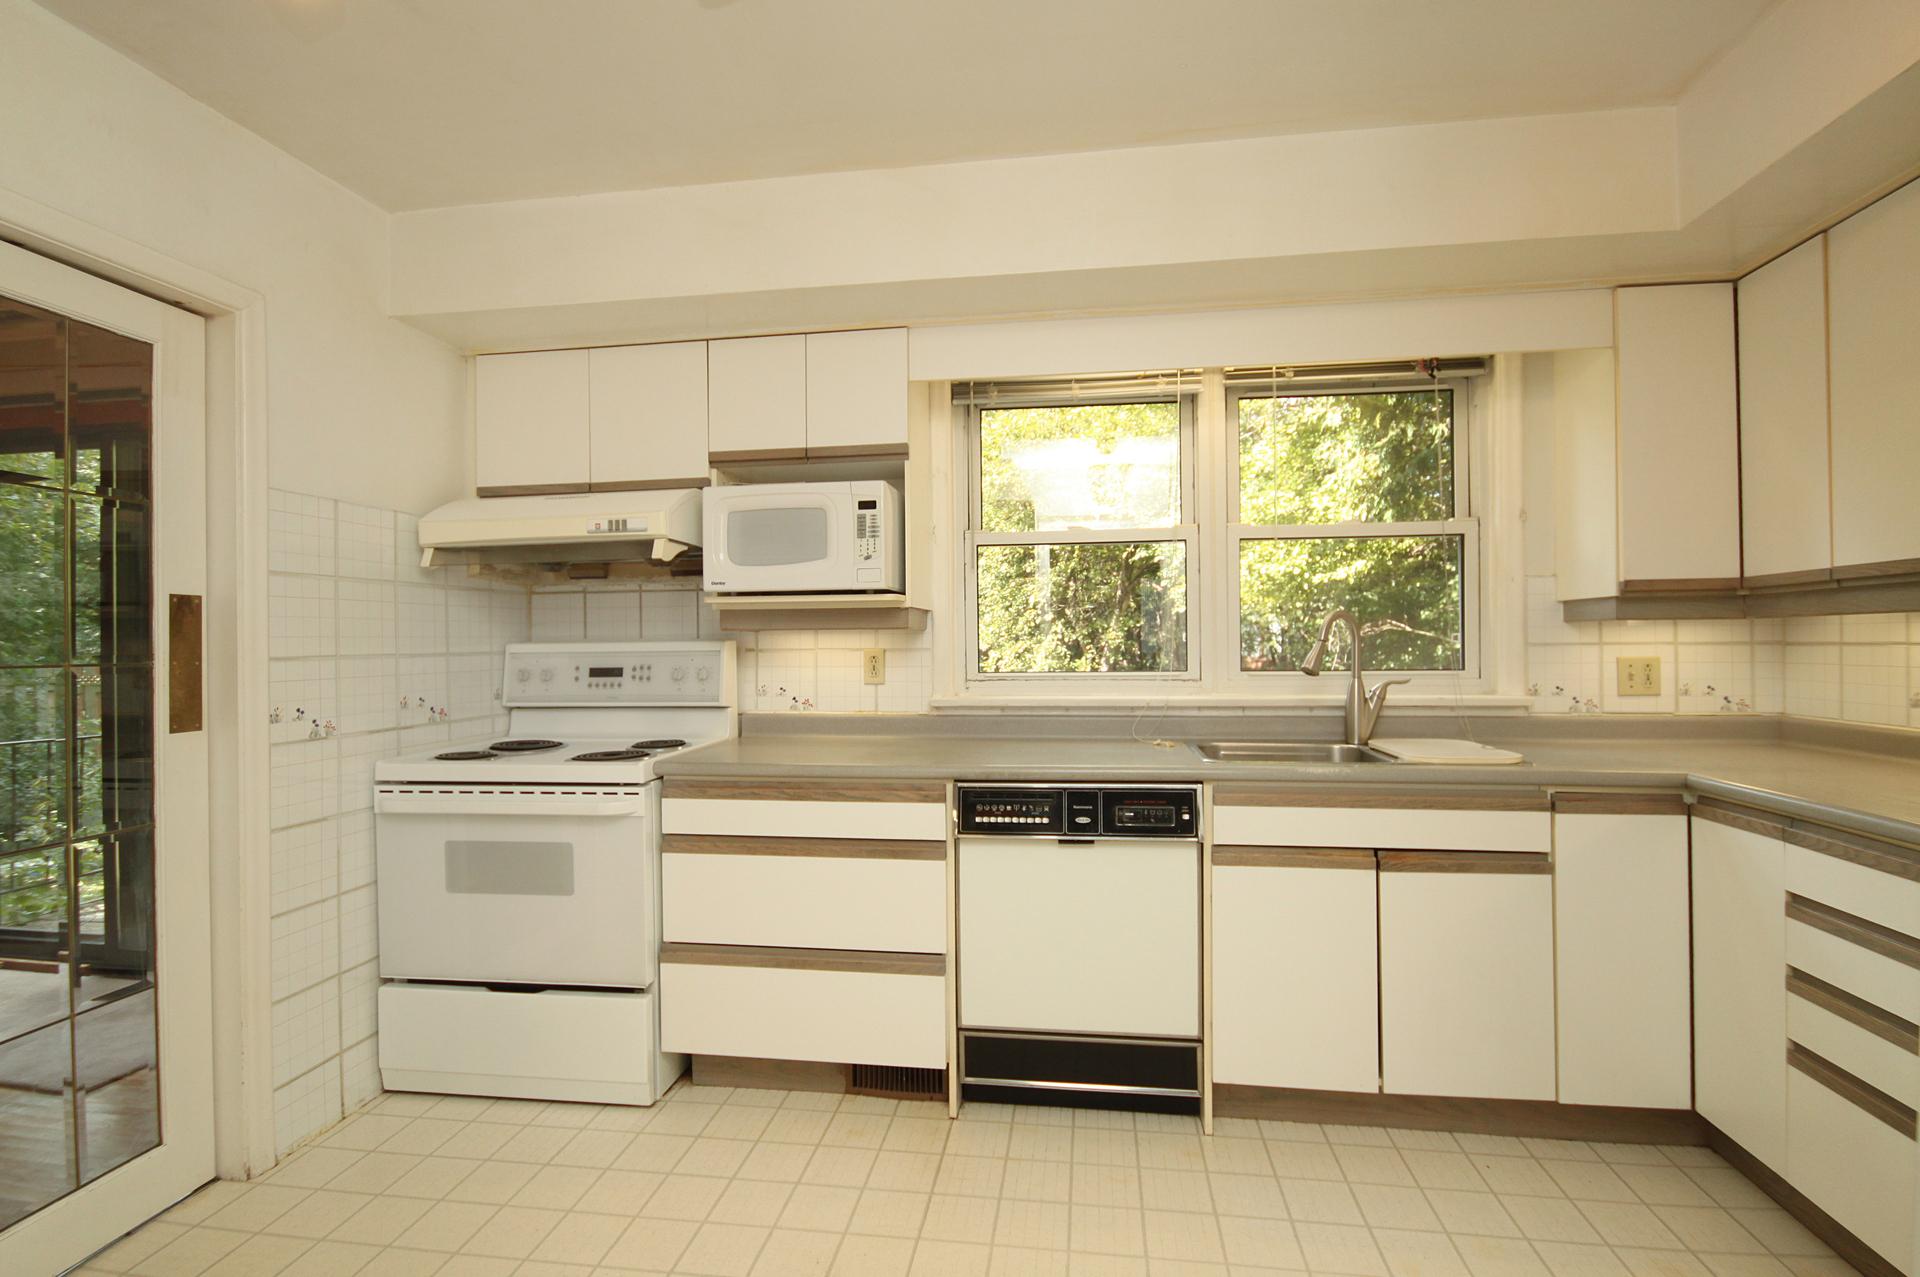 Kitchen at 59 Overton Crescent, Banbury-Don Mills, Toronto